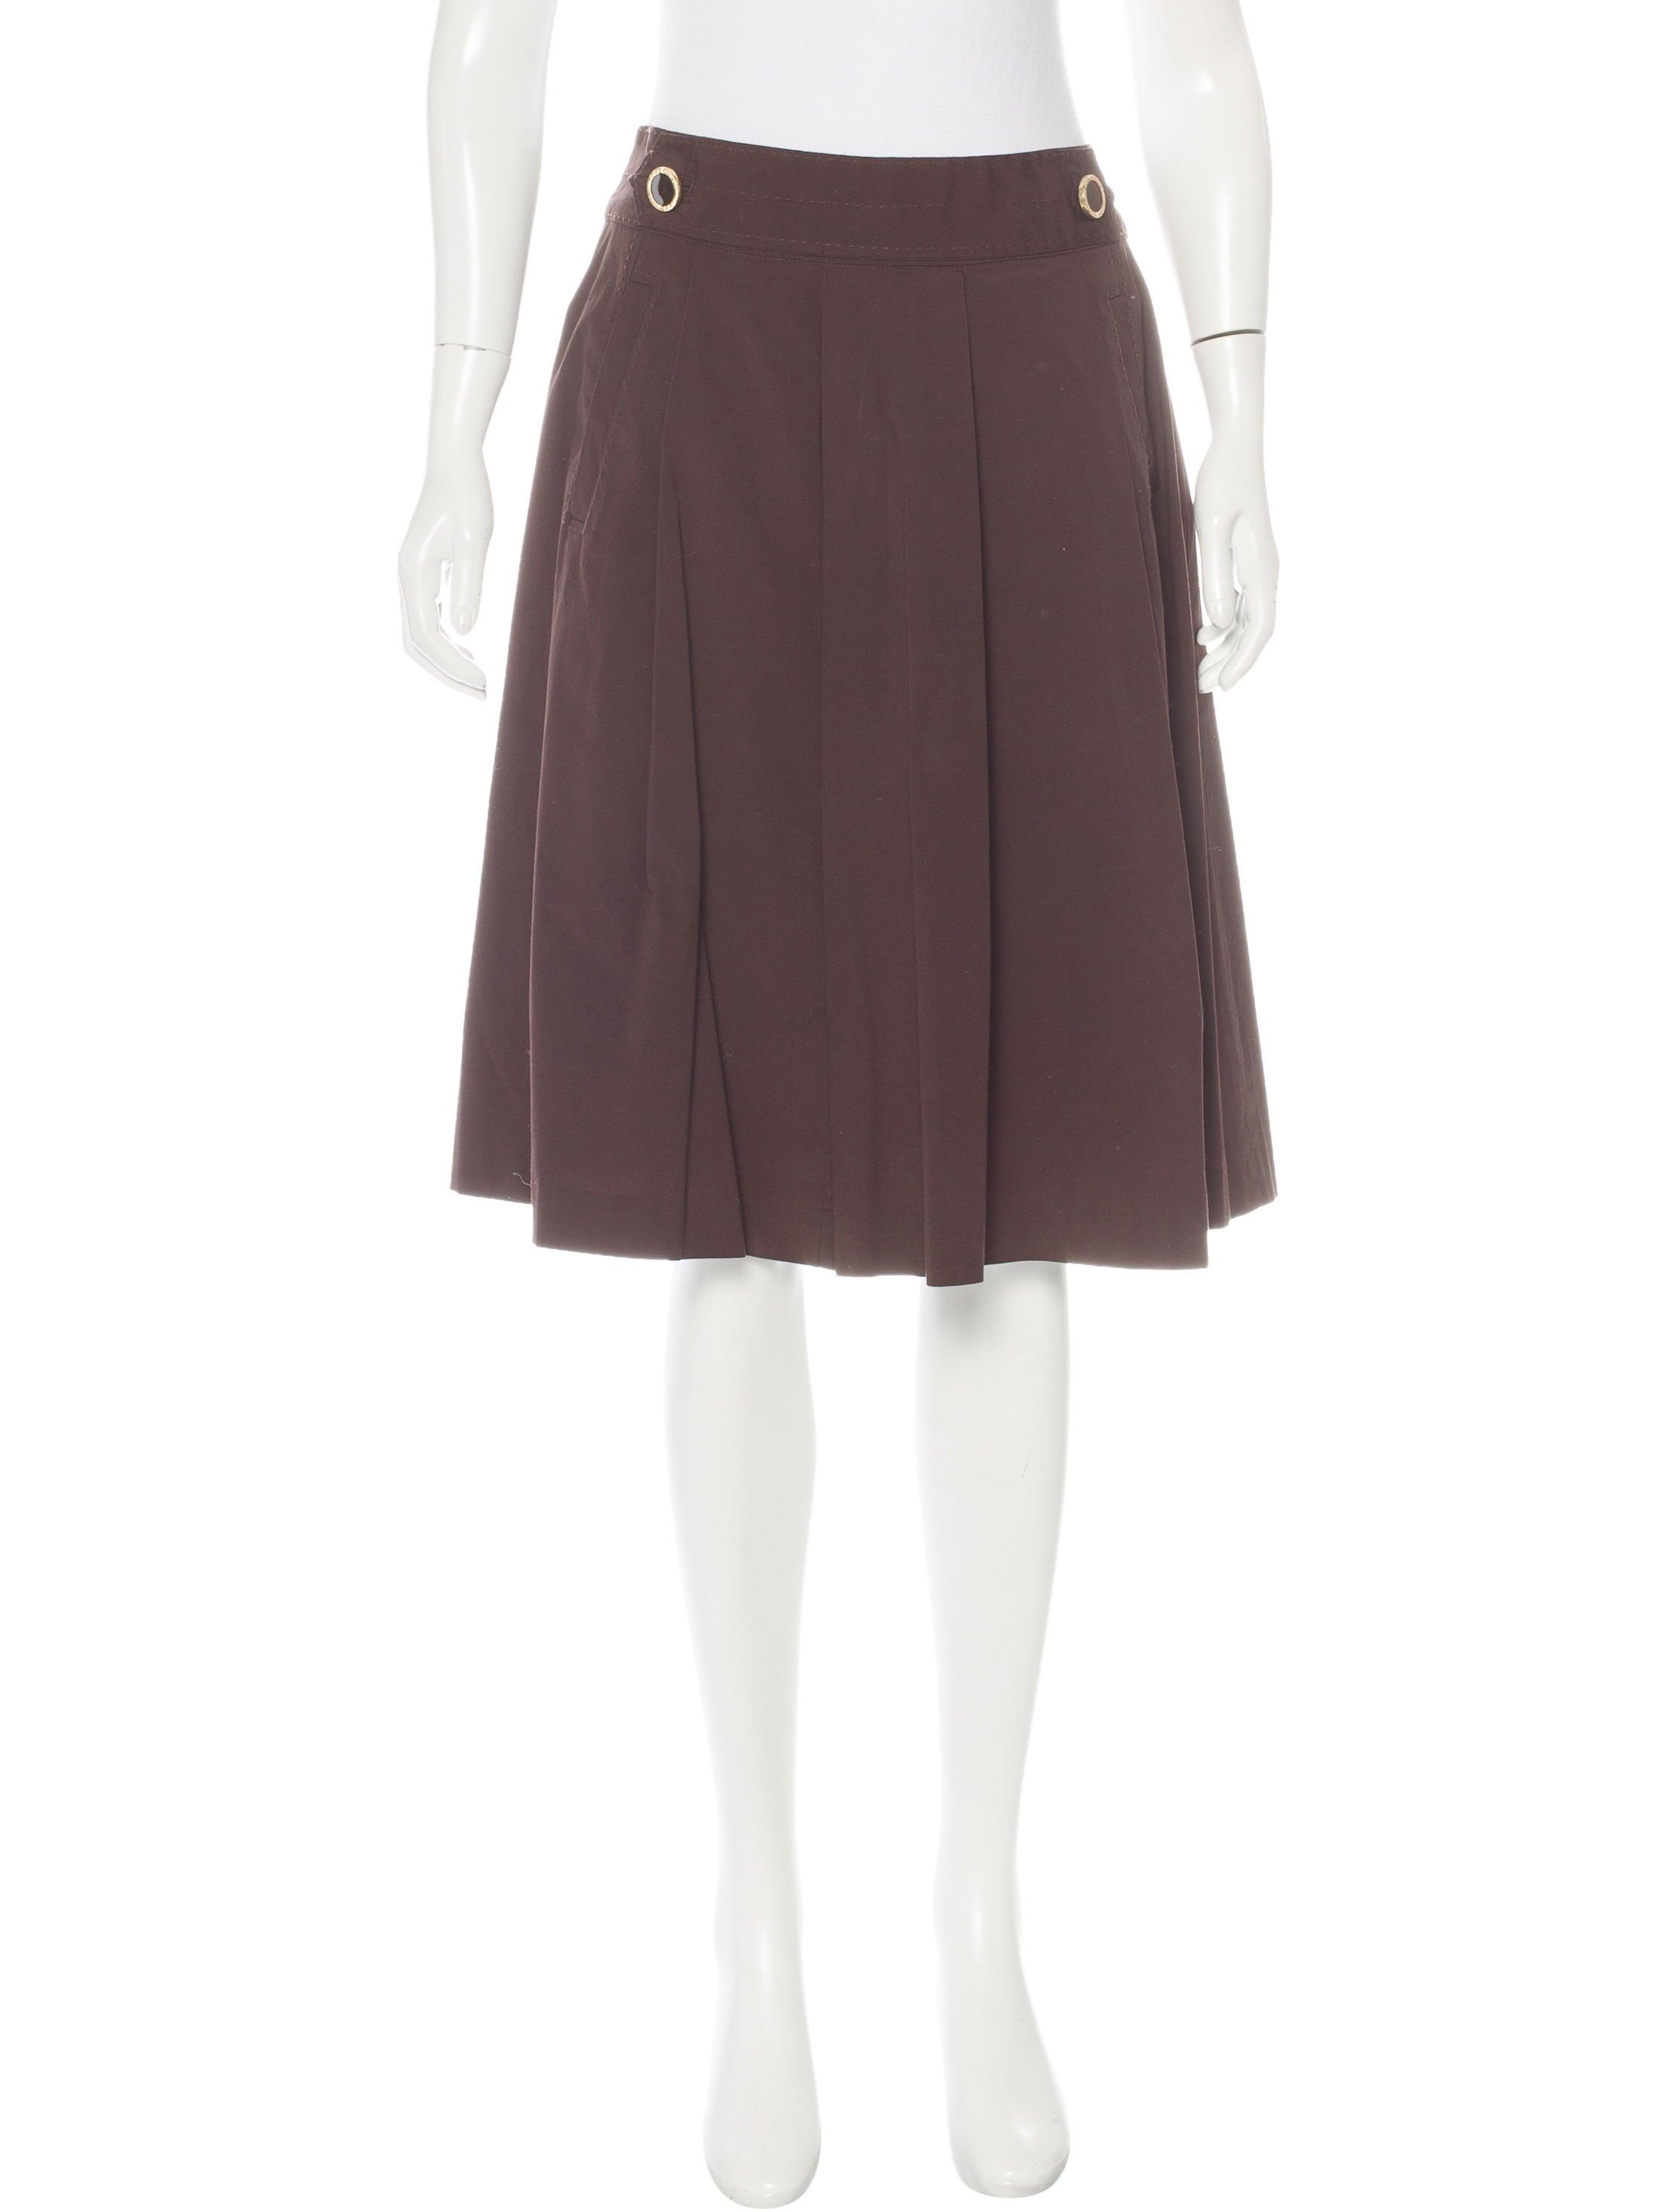 burch knee length a line skirt skirts wto91185